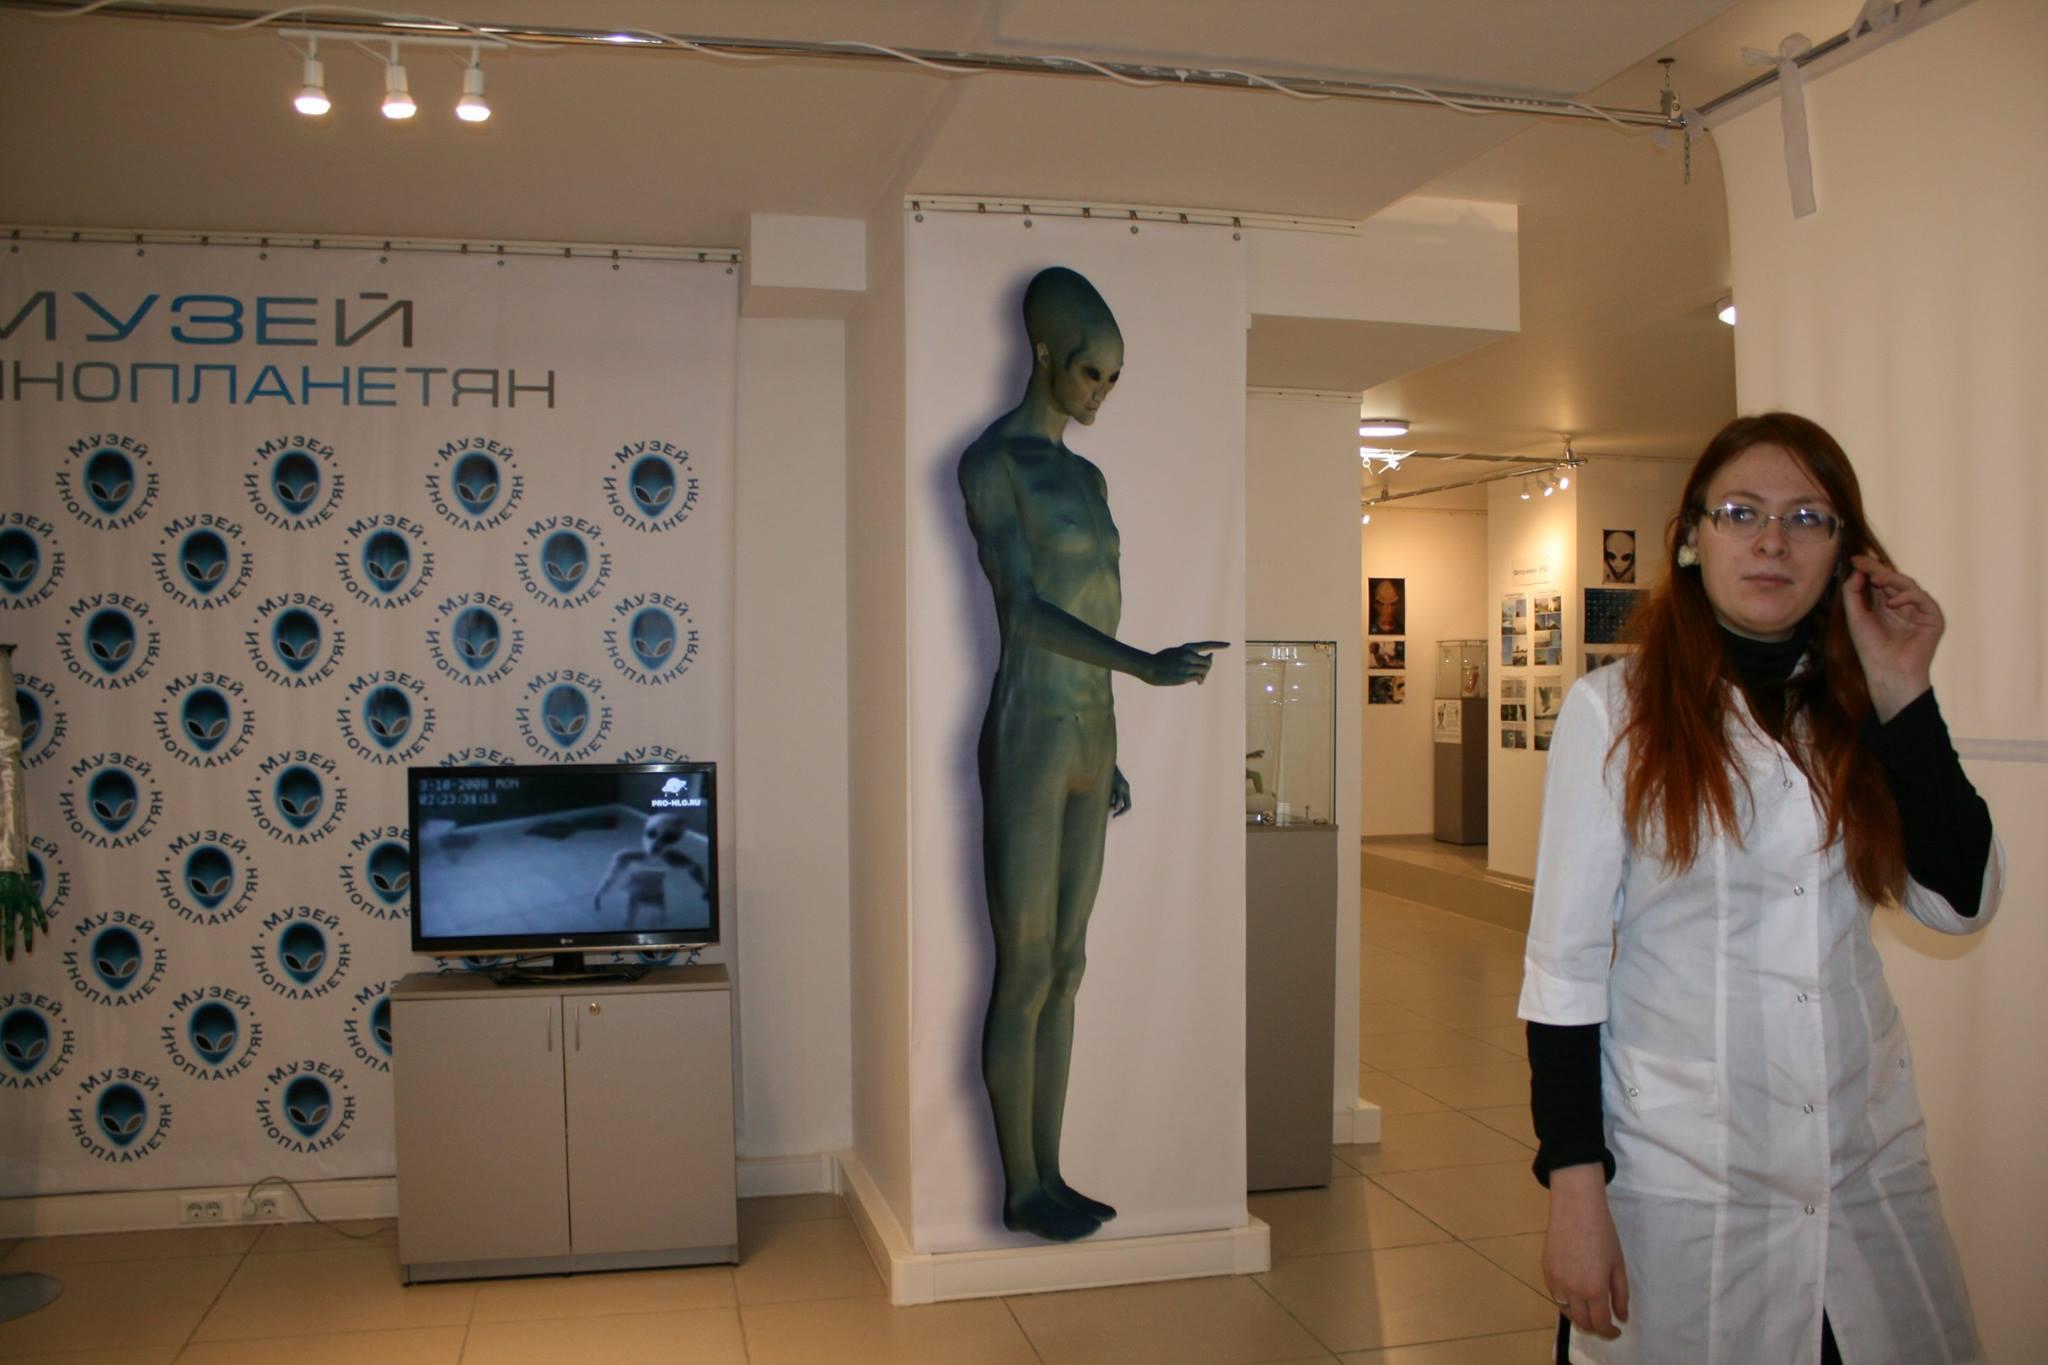 музей инопланетян новосибирск фото